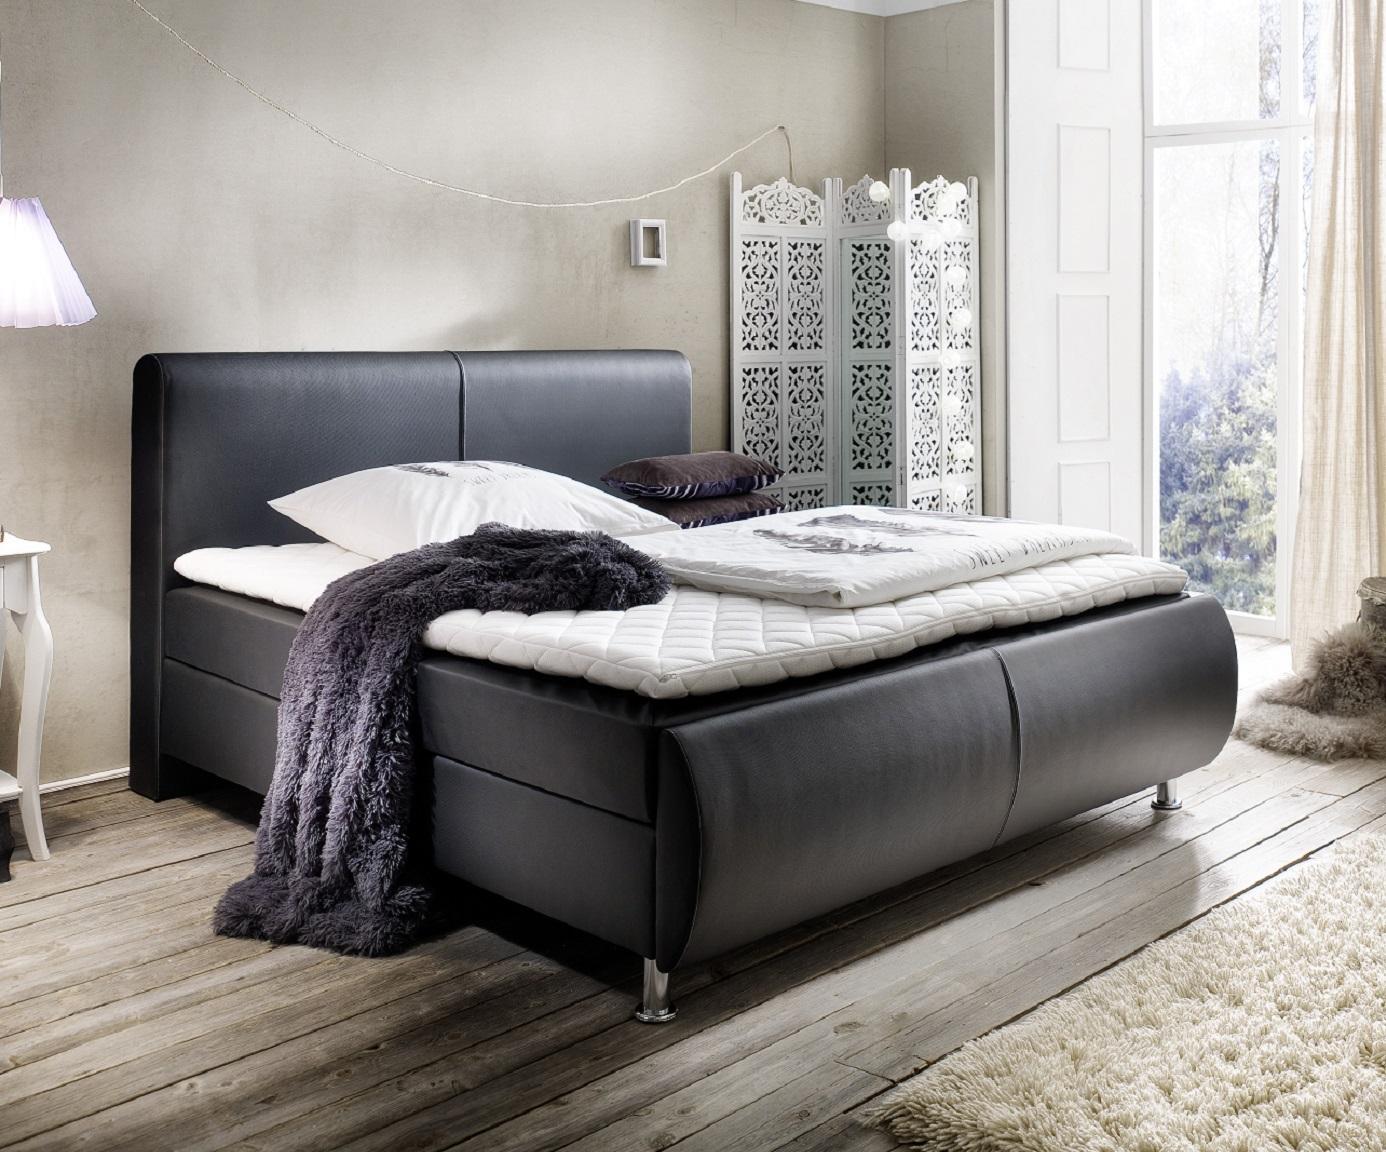 boxspringbett amond schwarz 140 x 200 cm. Black Bedroom Furniture Sets. Home Design Ideas